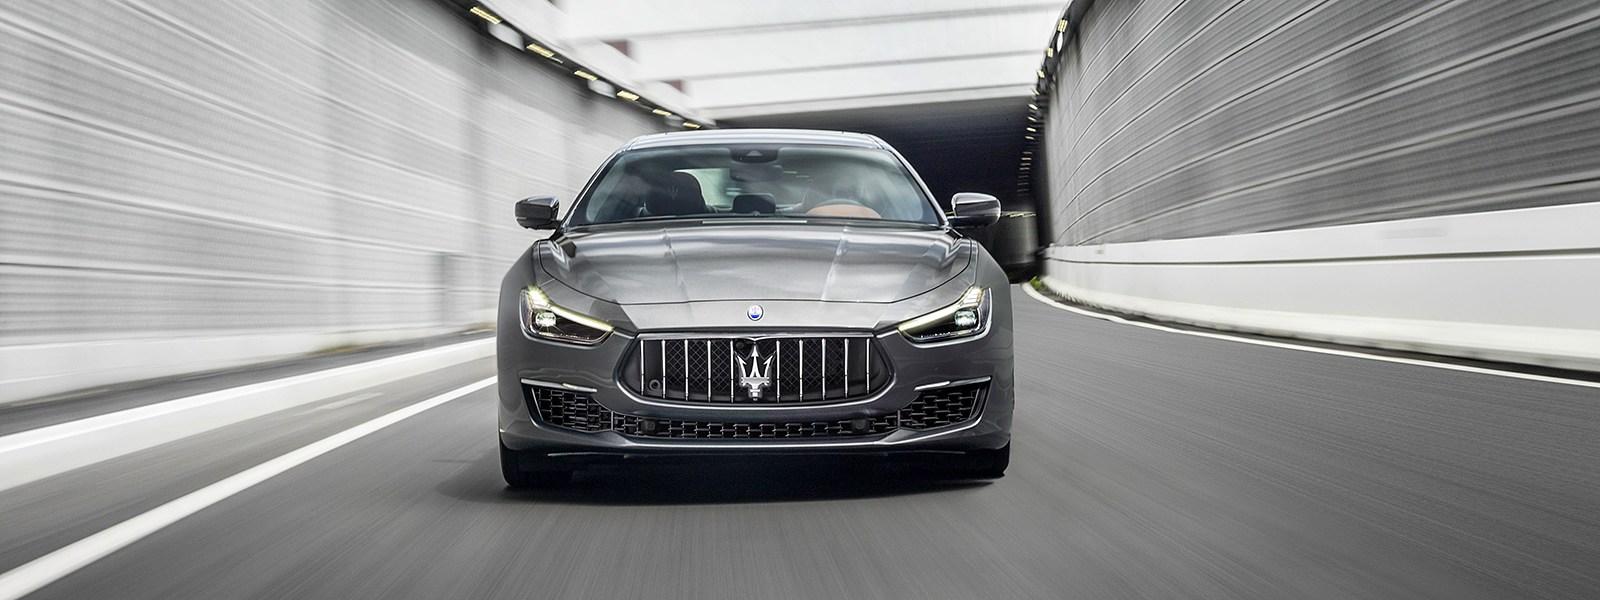 New Maserati Ghibli | Luxury Sedans for Sale in Grandville